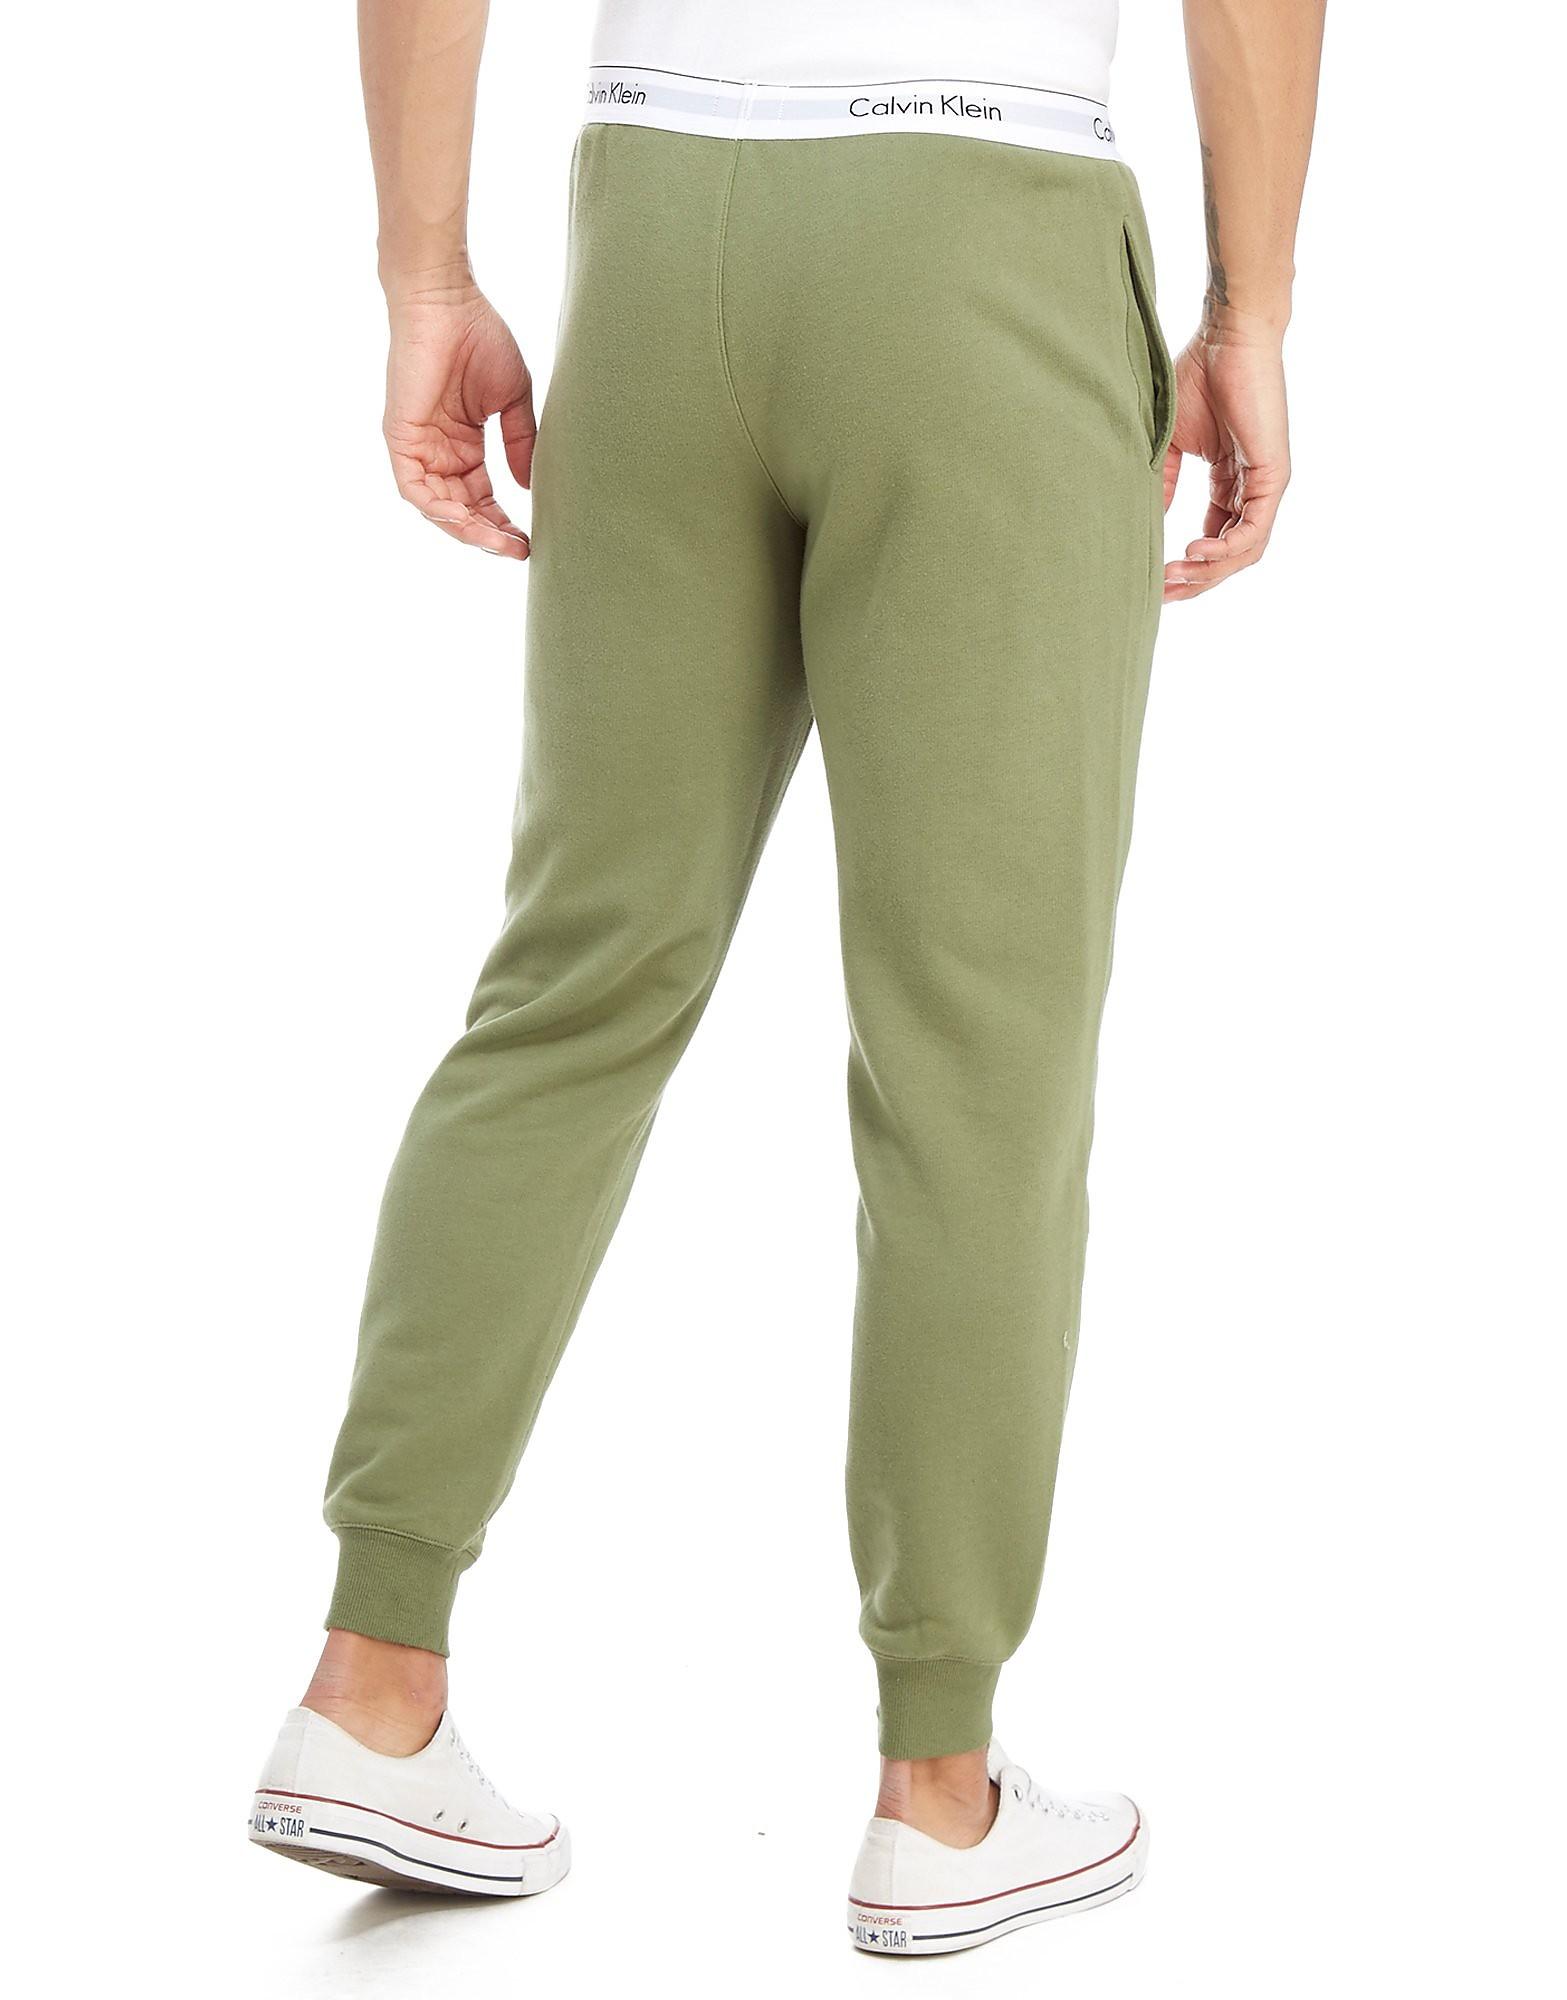 Calvin Klein Tape Pants